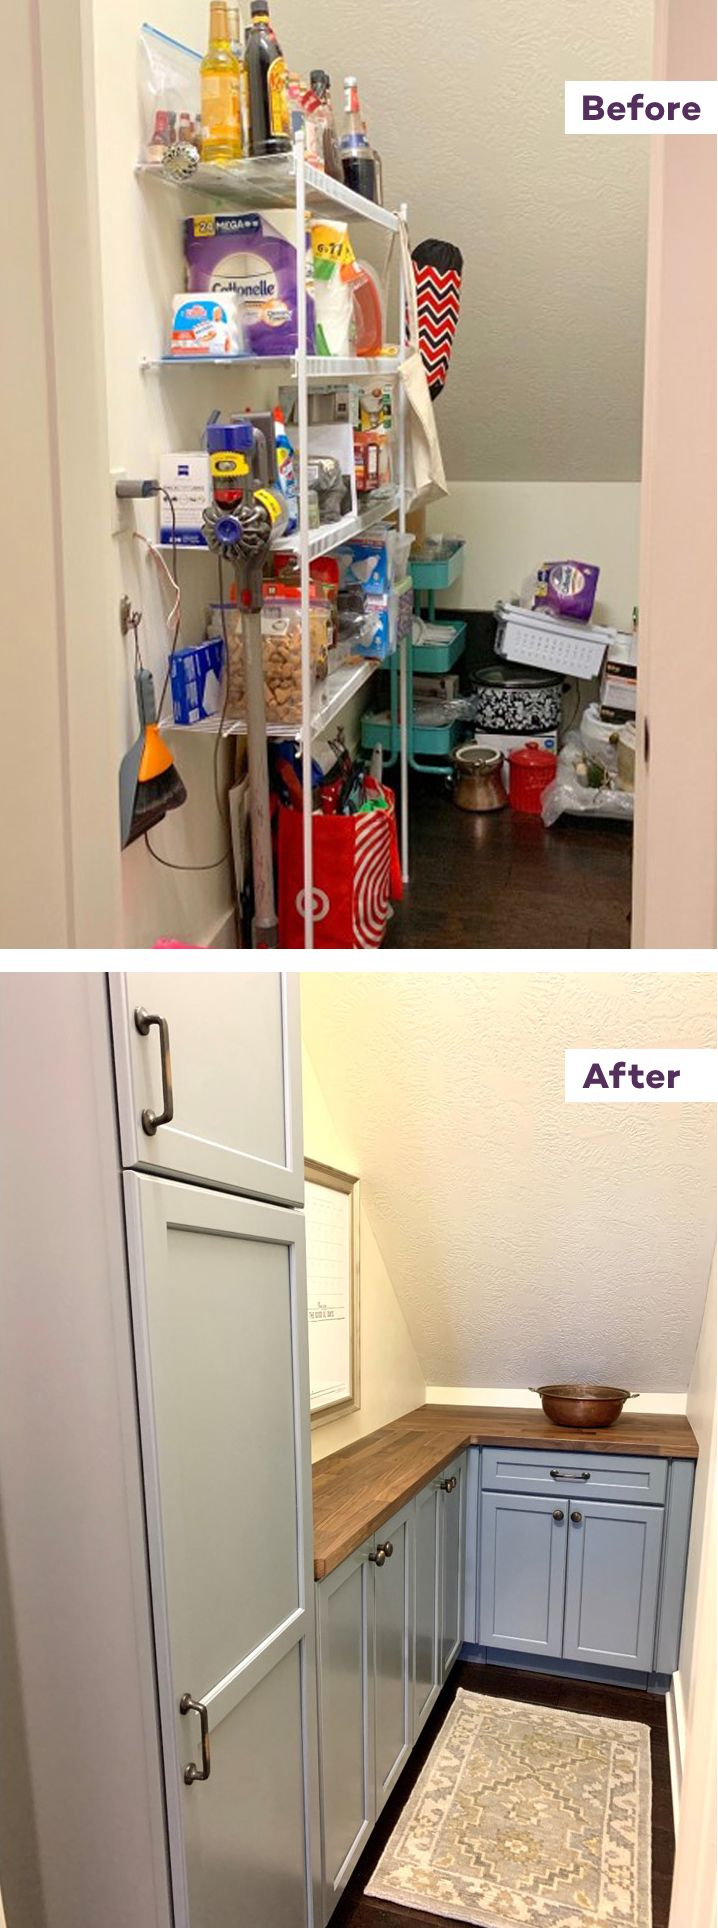 pantry remodel part 2: the big reveal   pantry remodel, small pantry organization, small pantry